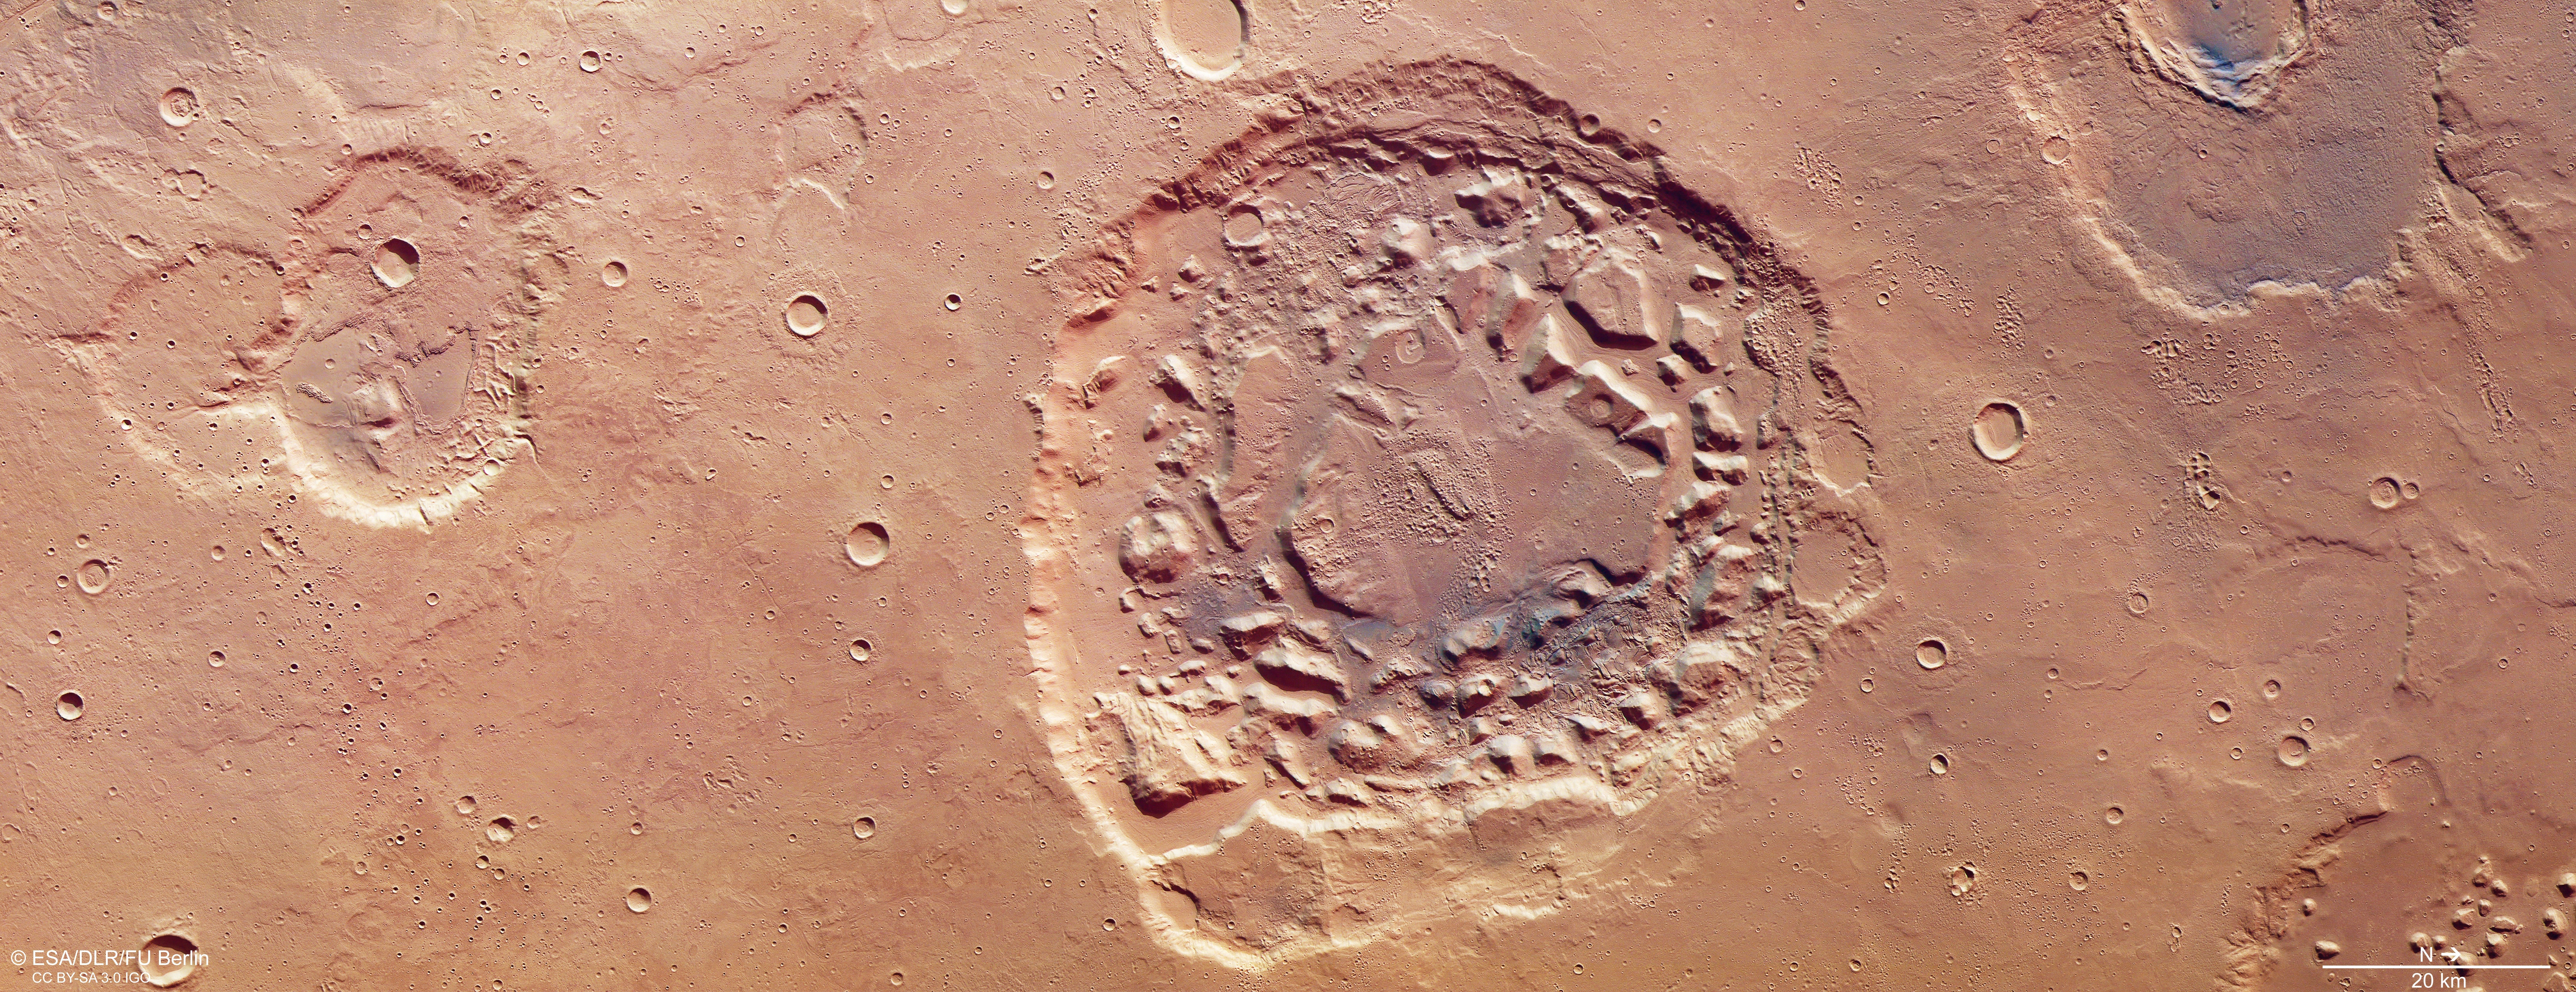 Marte, cratera (Foto: ESA )